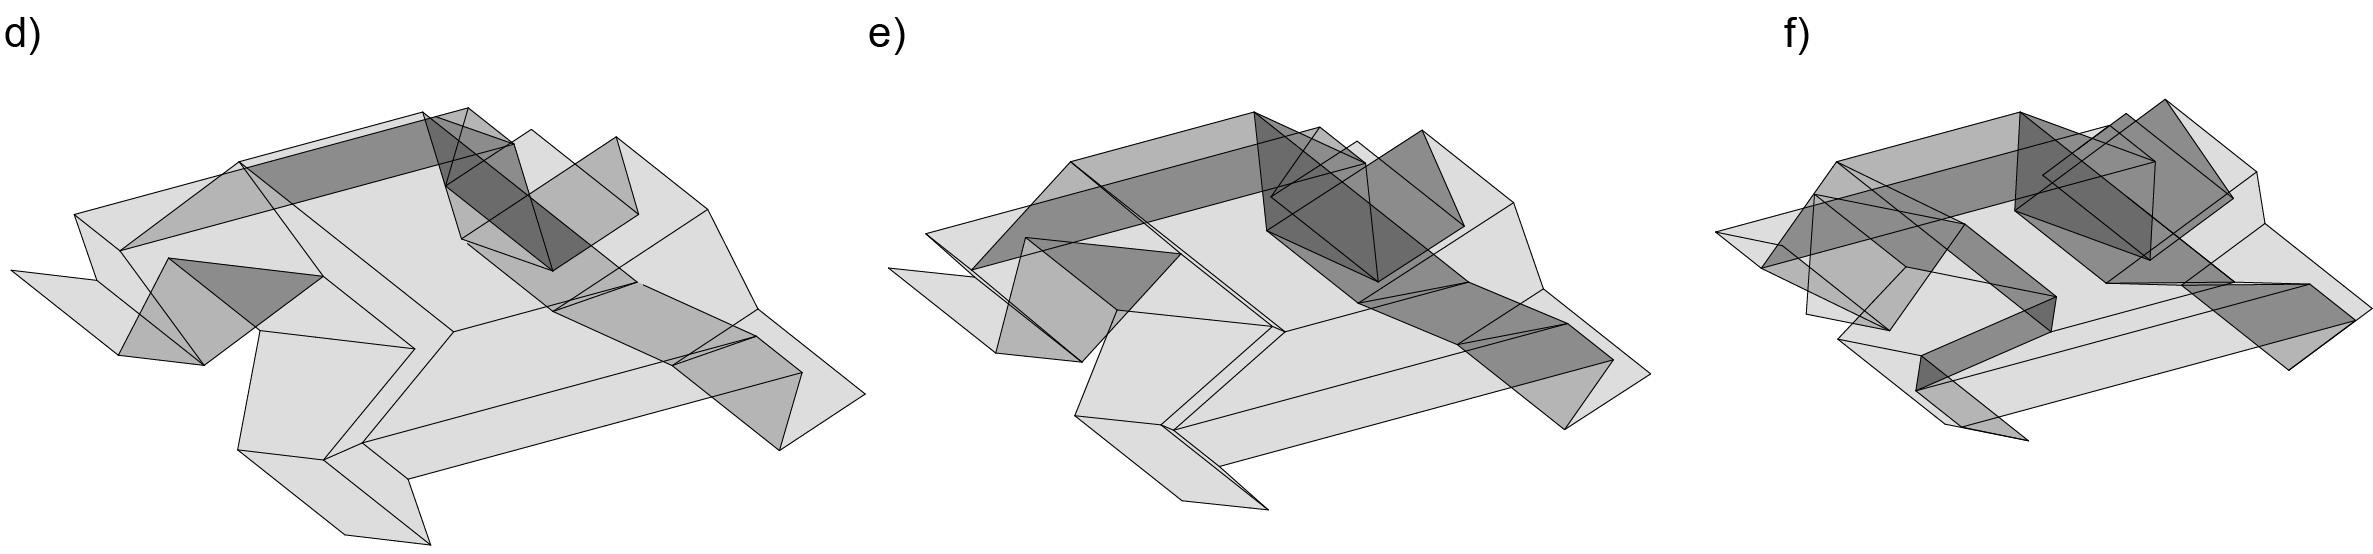 Nicoleta Bostan Math IA - Origami Geometric Proofs   Geometry ...   554x2373